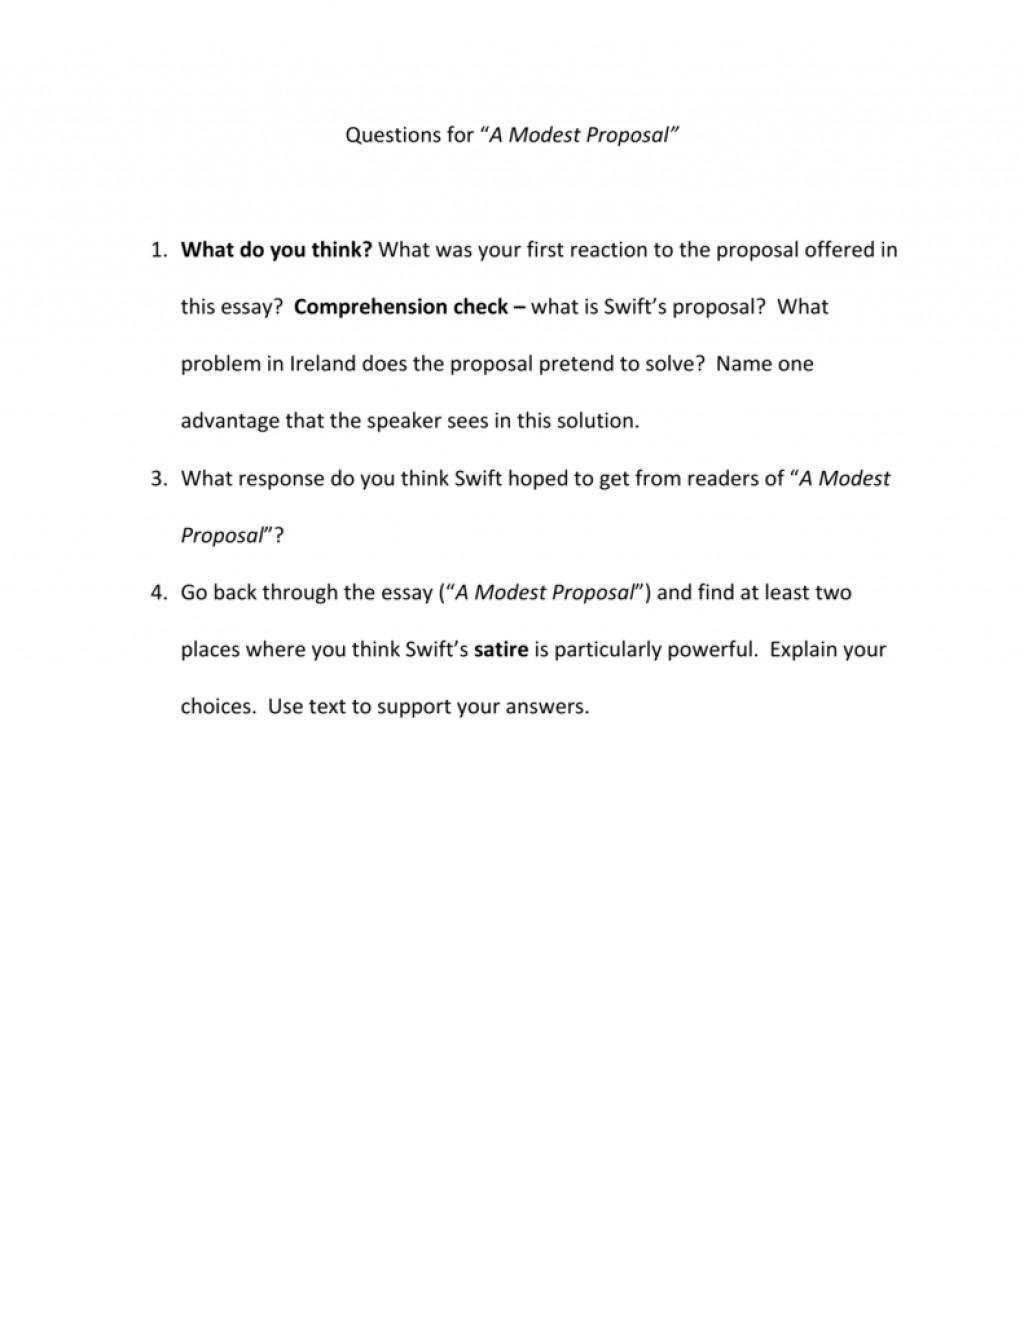 022 Modest Proposal Essay 007750259 2 Exceptional Conclusion Topics Prompts Large